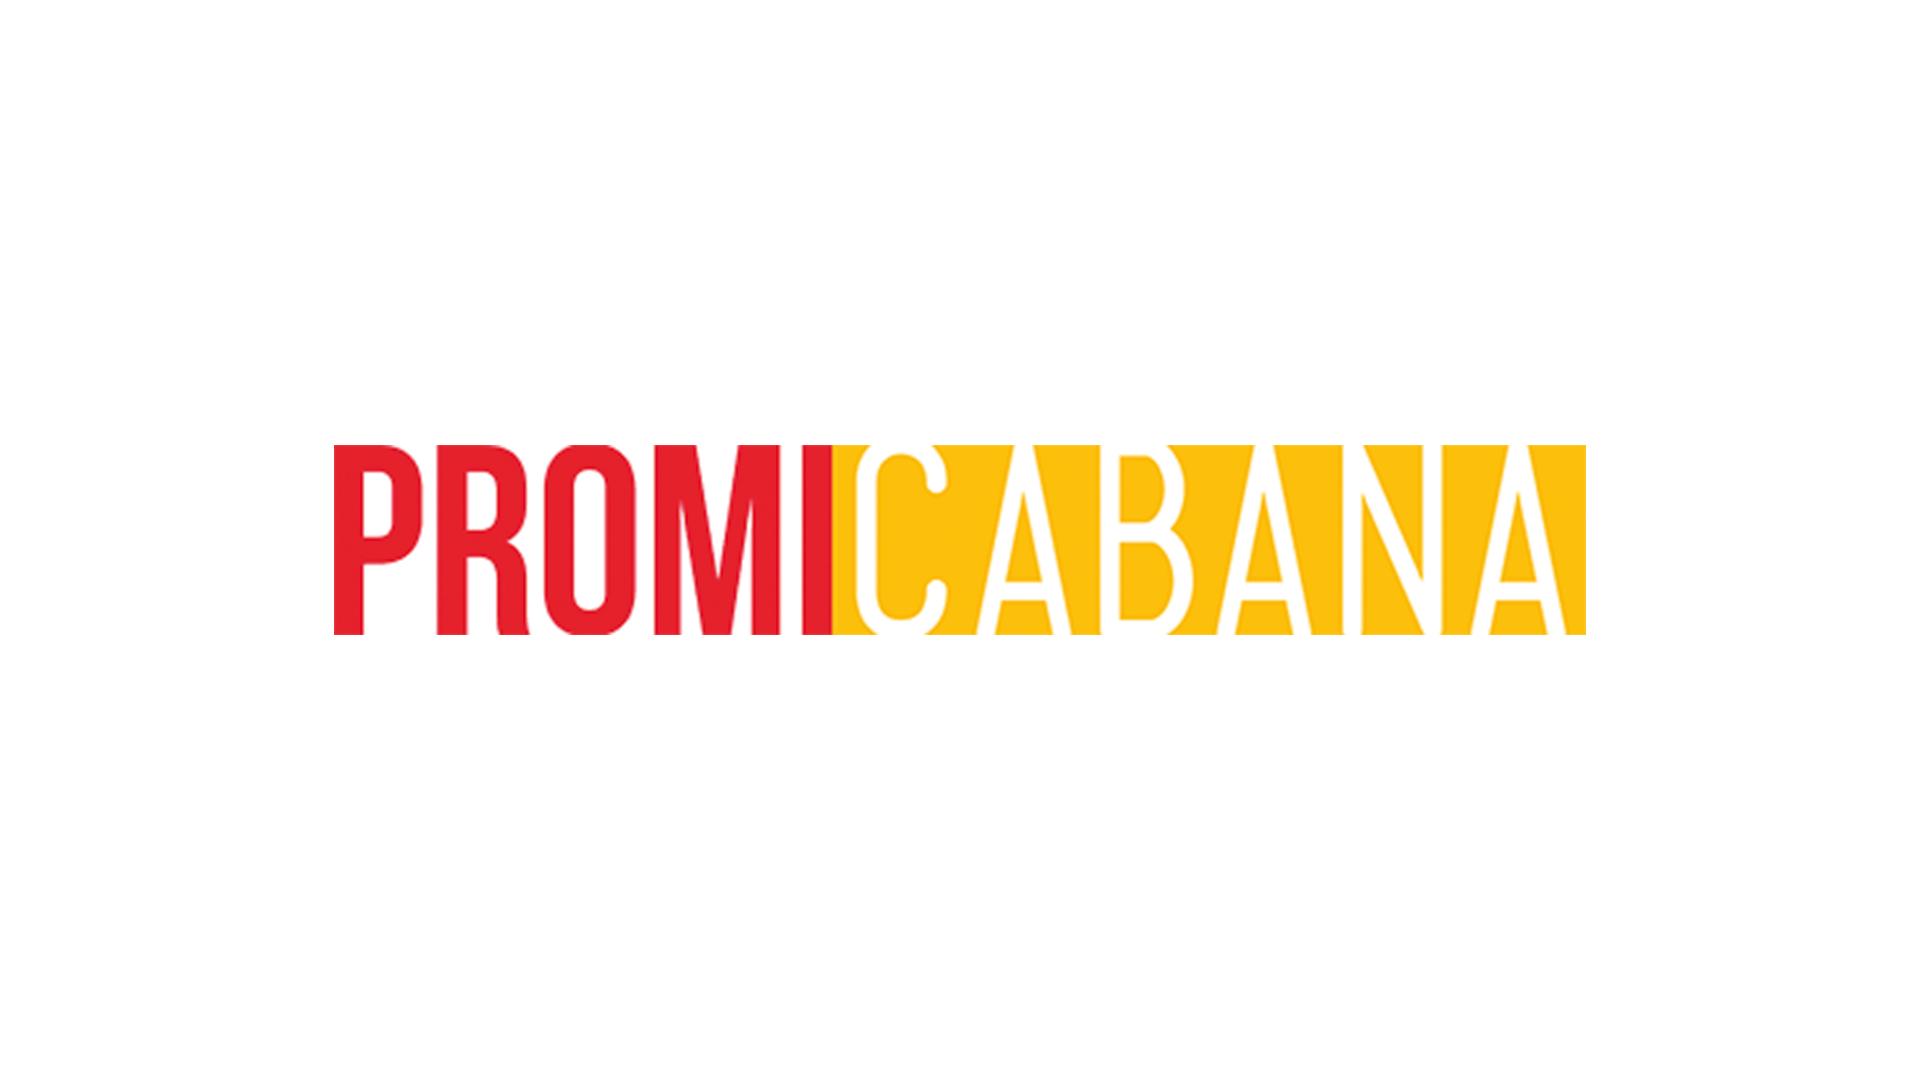 Miley-Cyrus-Wrecking-Ball-Musikvideo-8